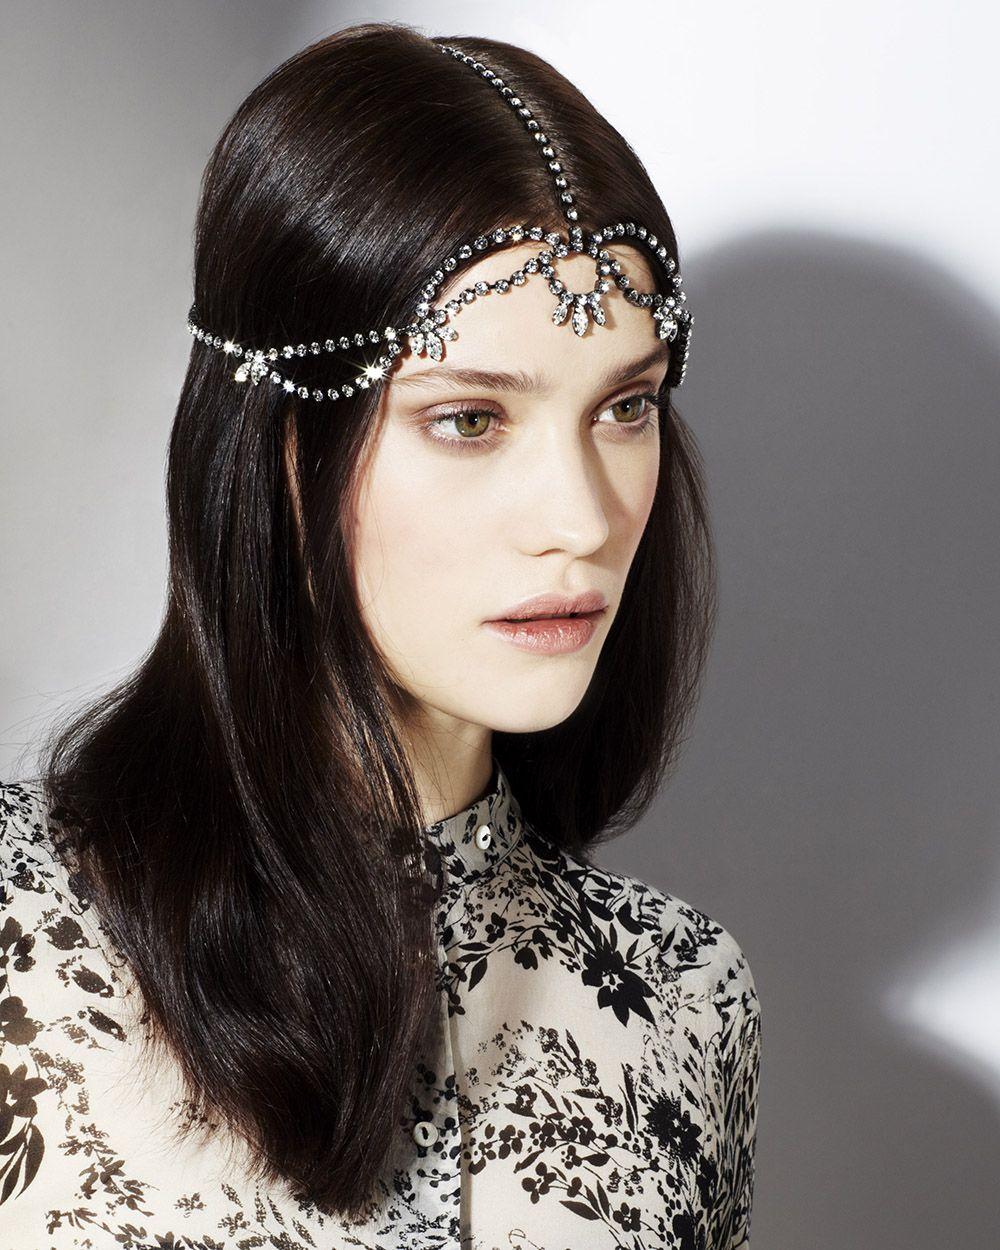 bec3e7d3d28d Jennifer Behr Delphinius Diadem    Swarovski crystal headpiece handmade in  New York City